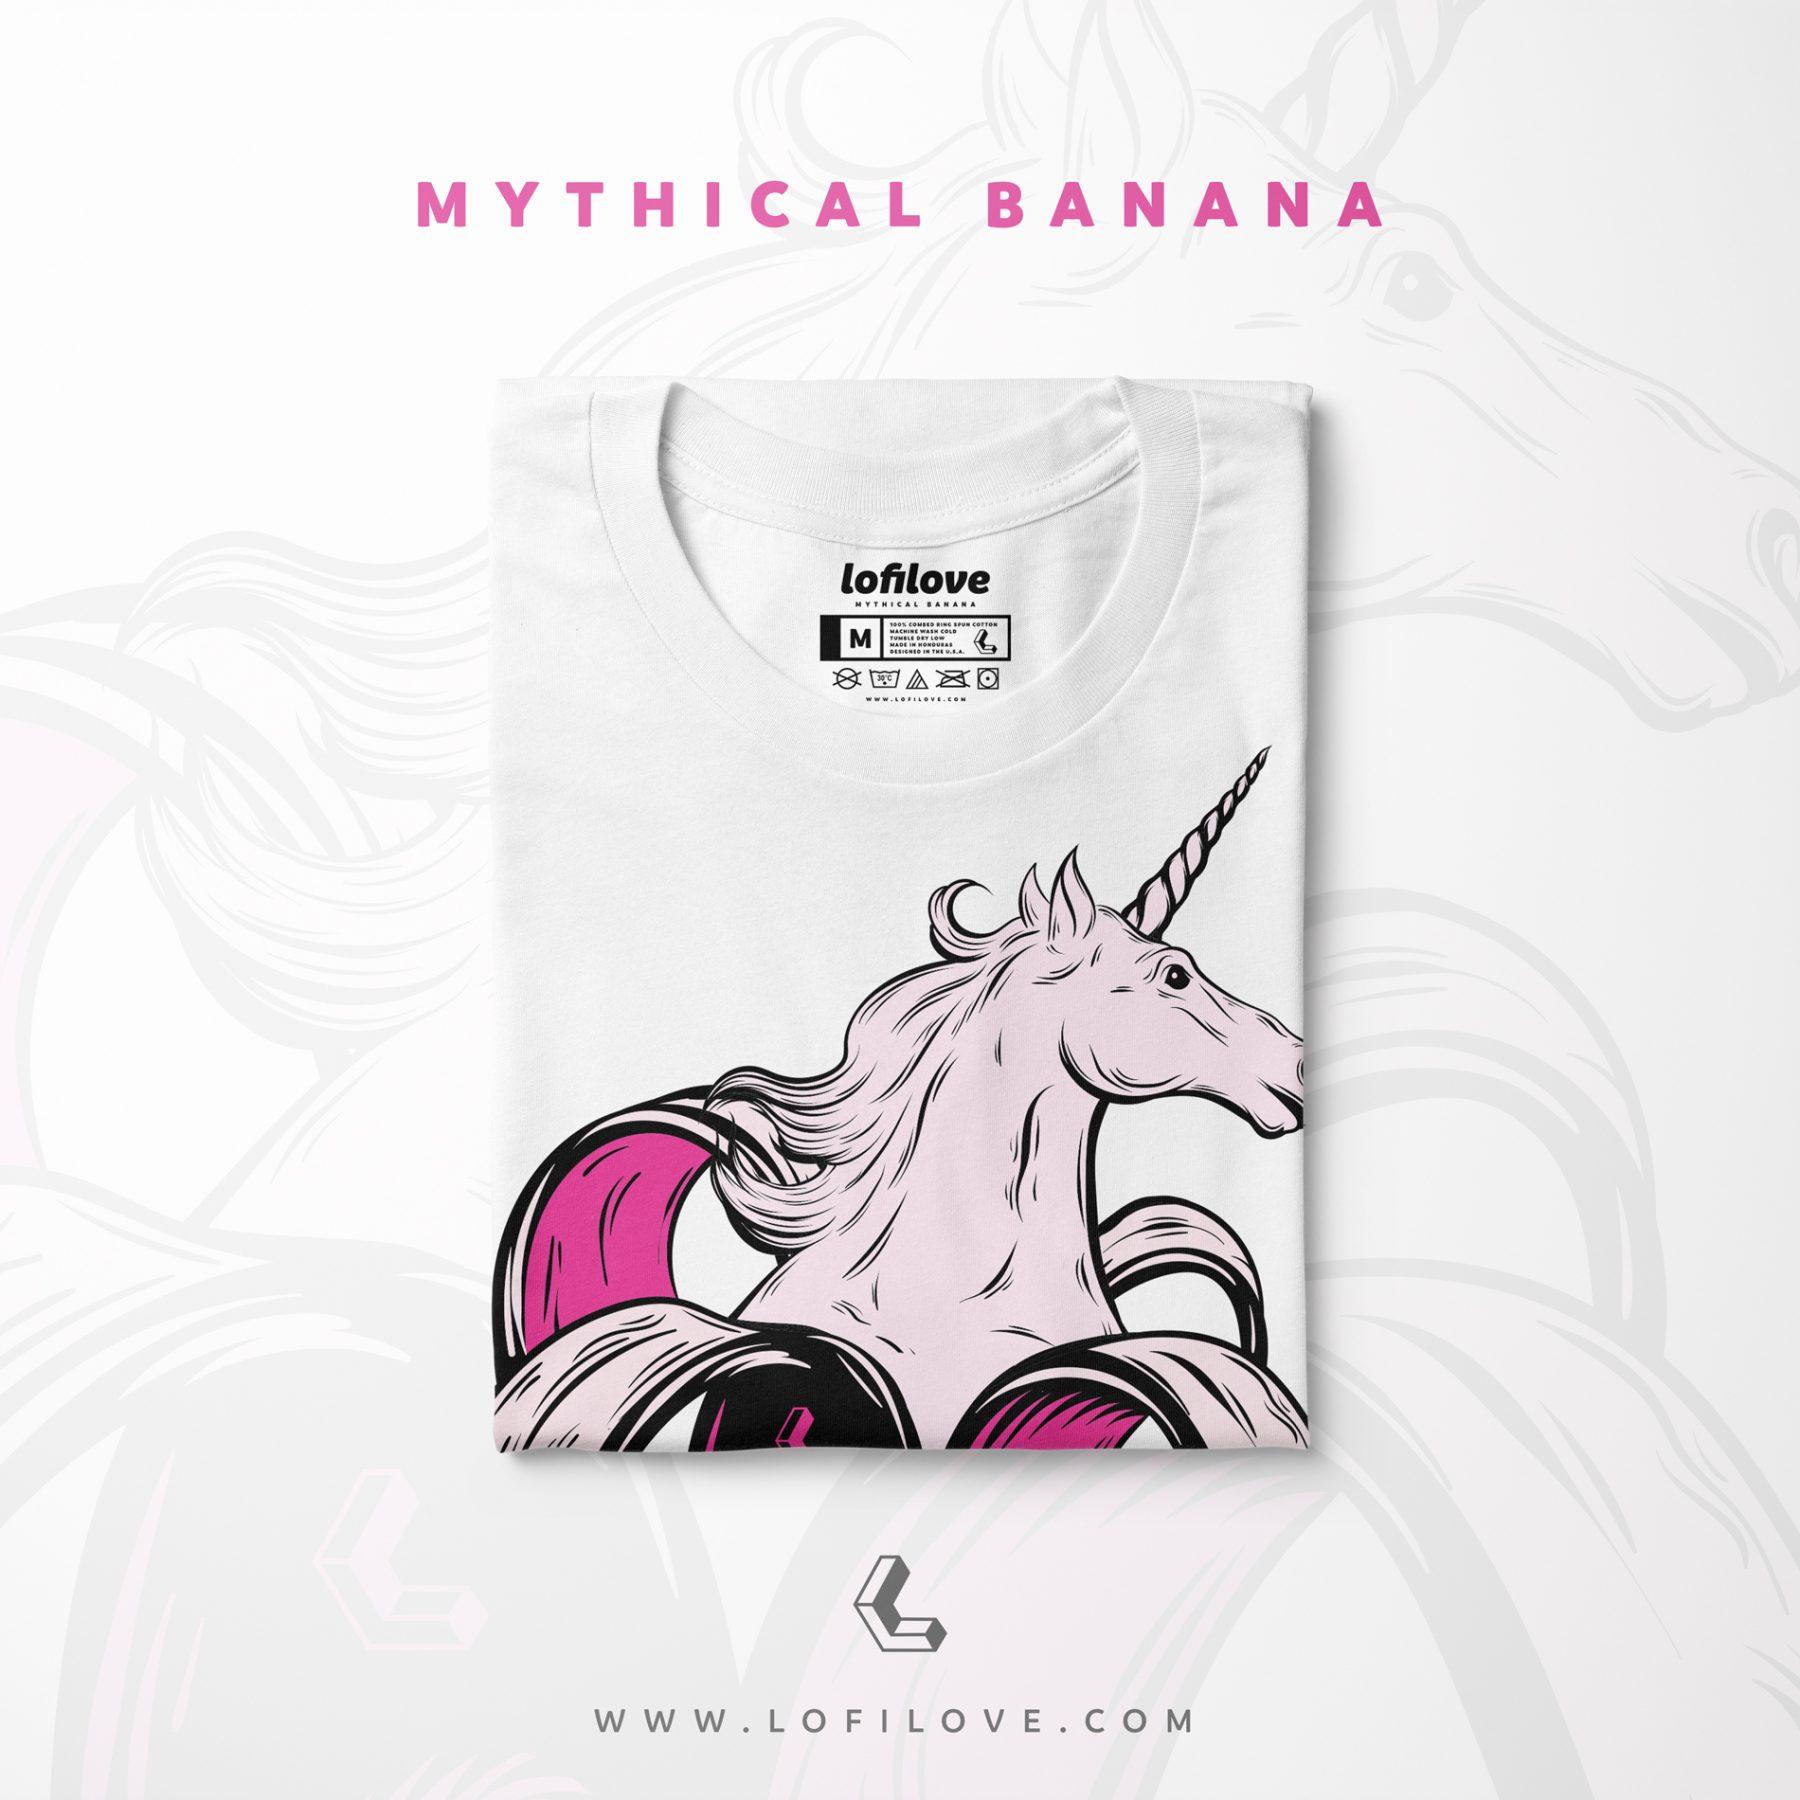 lofi-love-mythical-banana-tee-2